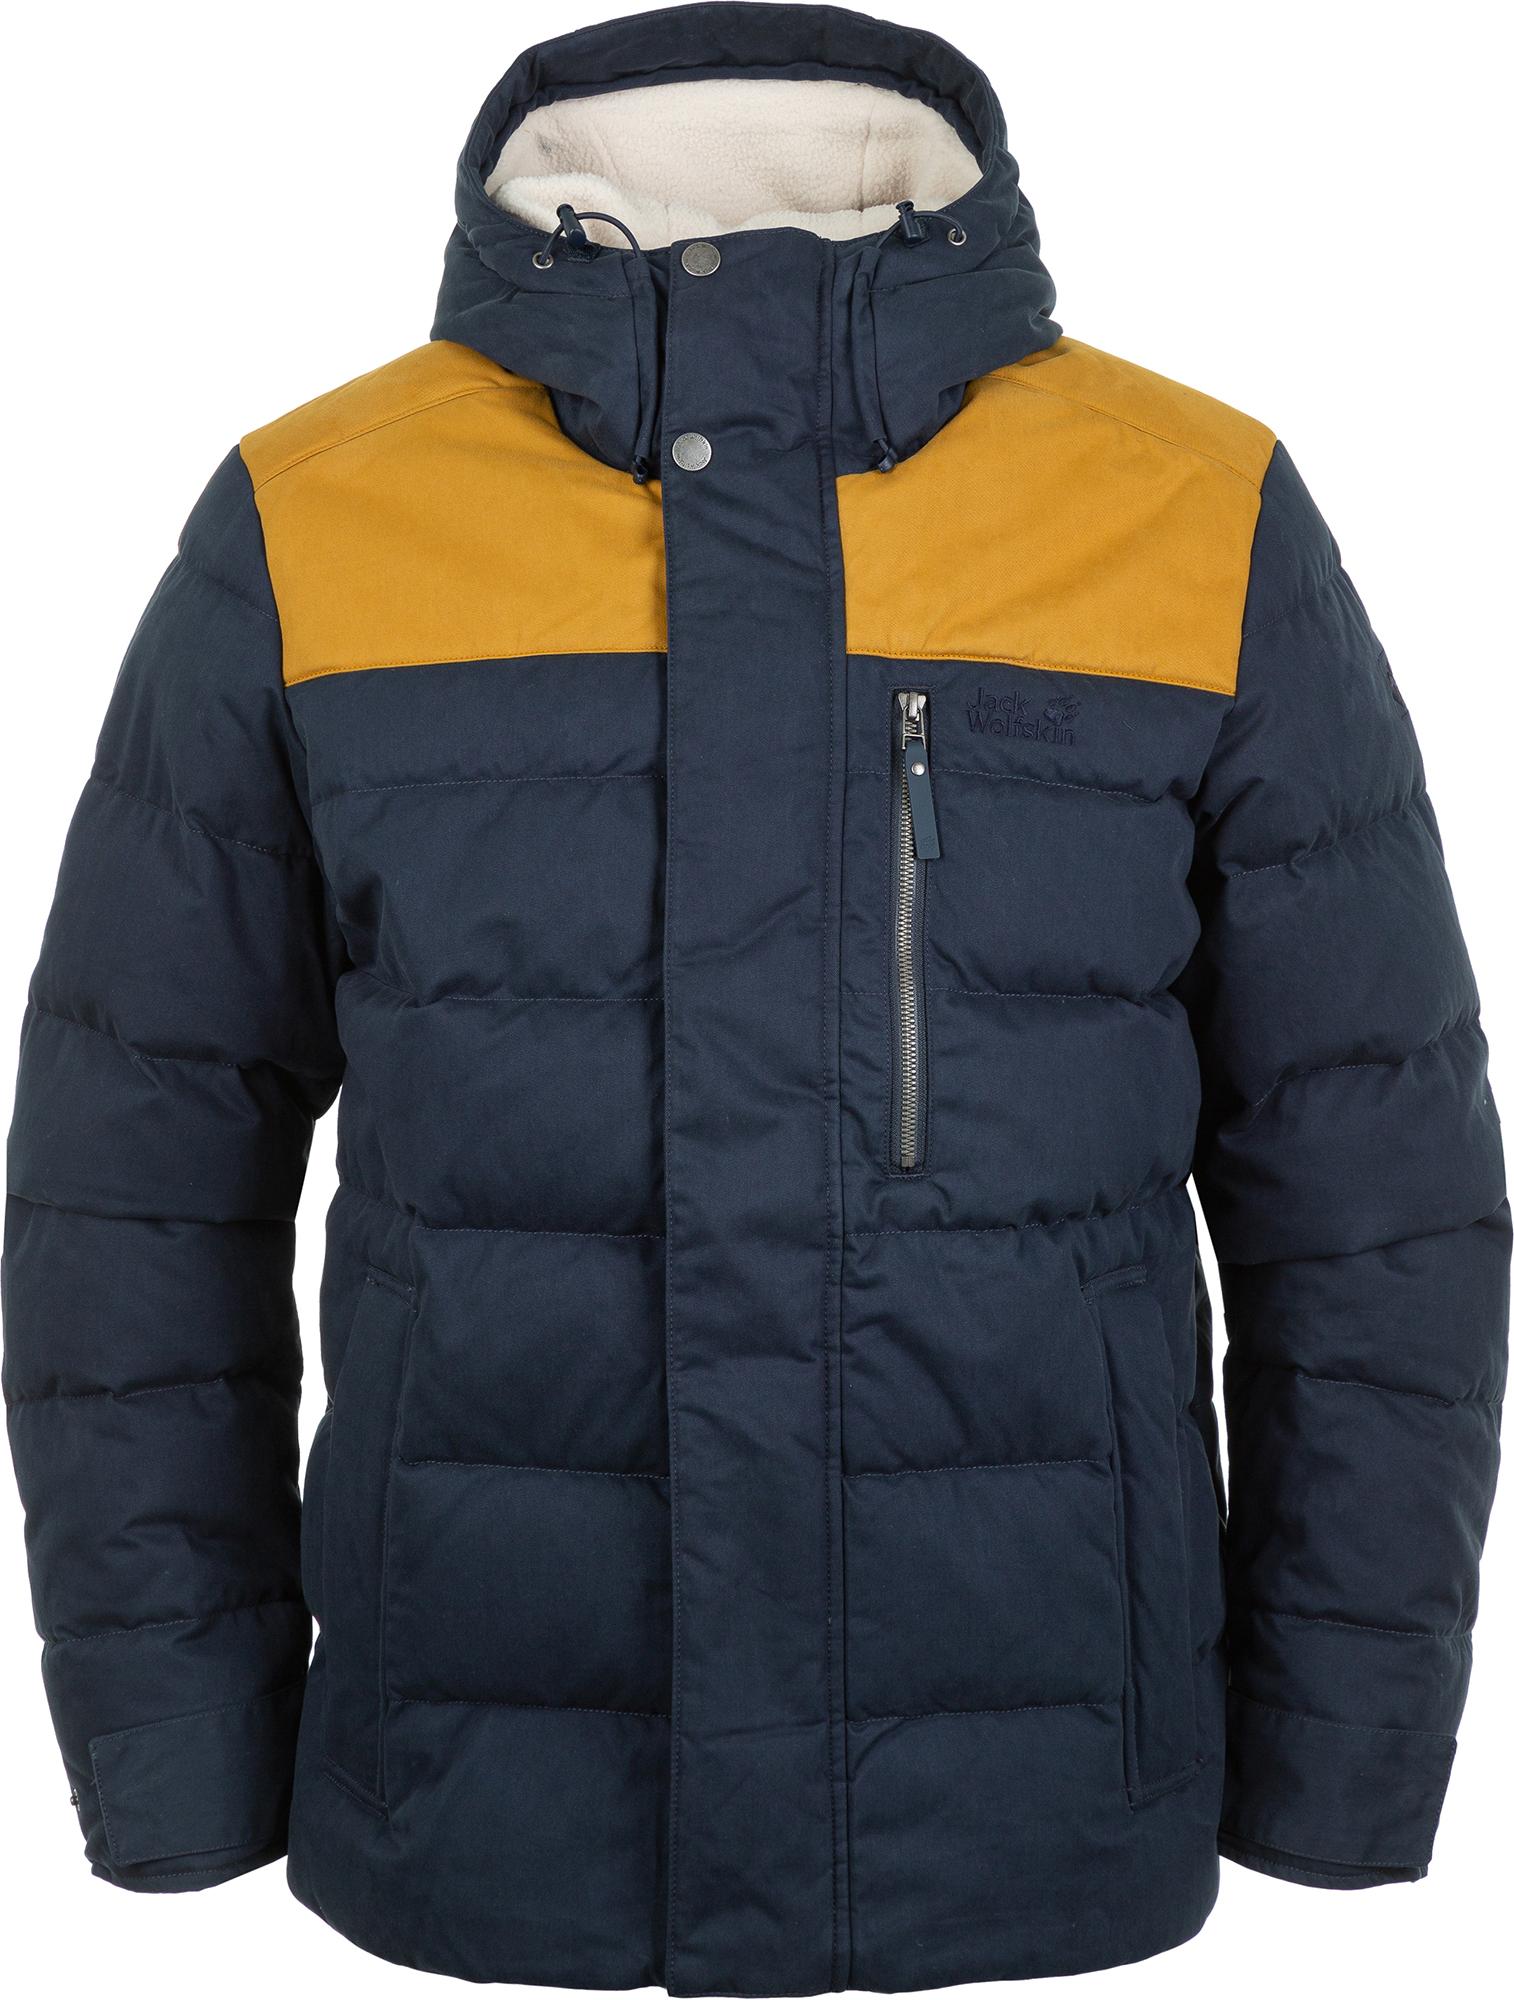 Jack Wolfskin Куртка пуховая мужская Lakota, размер 58